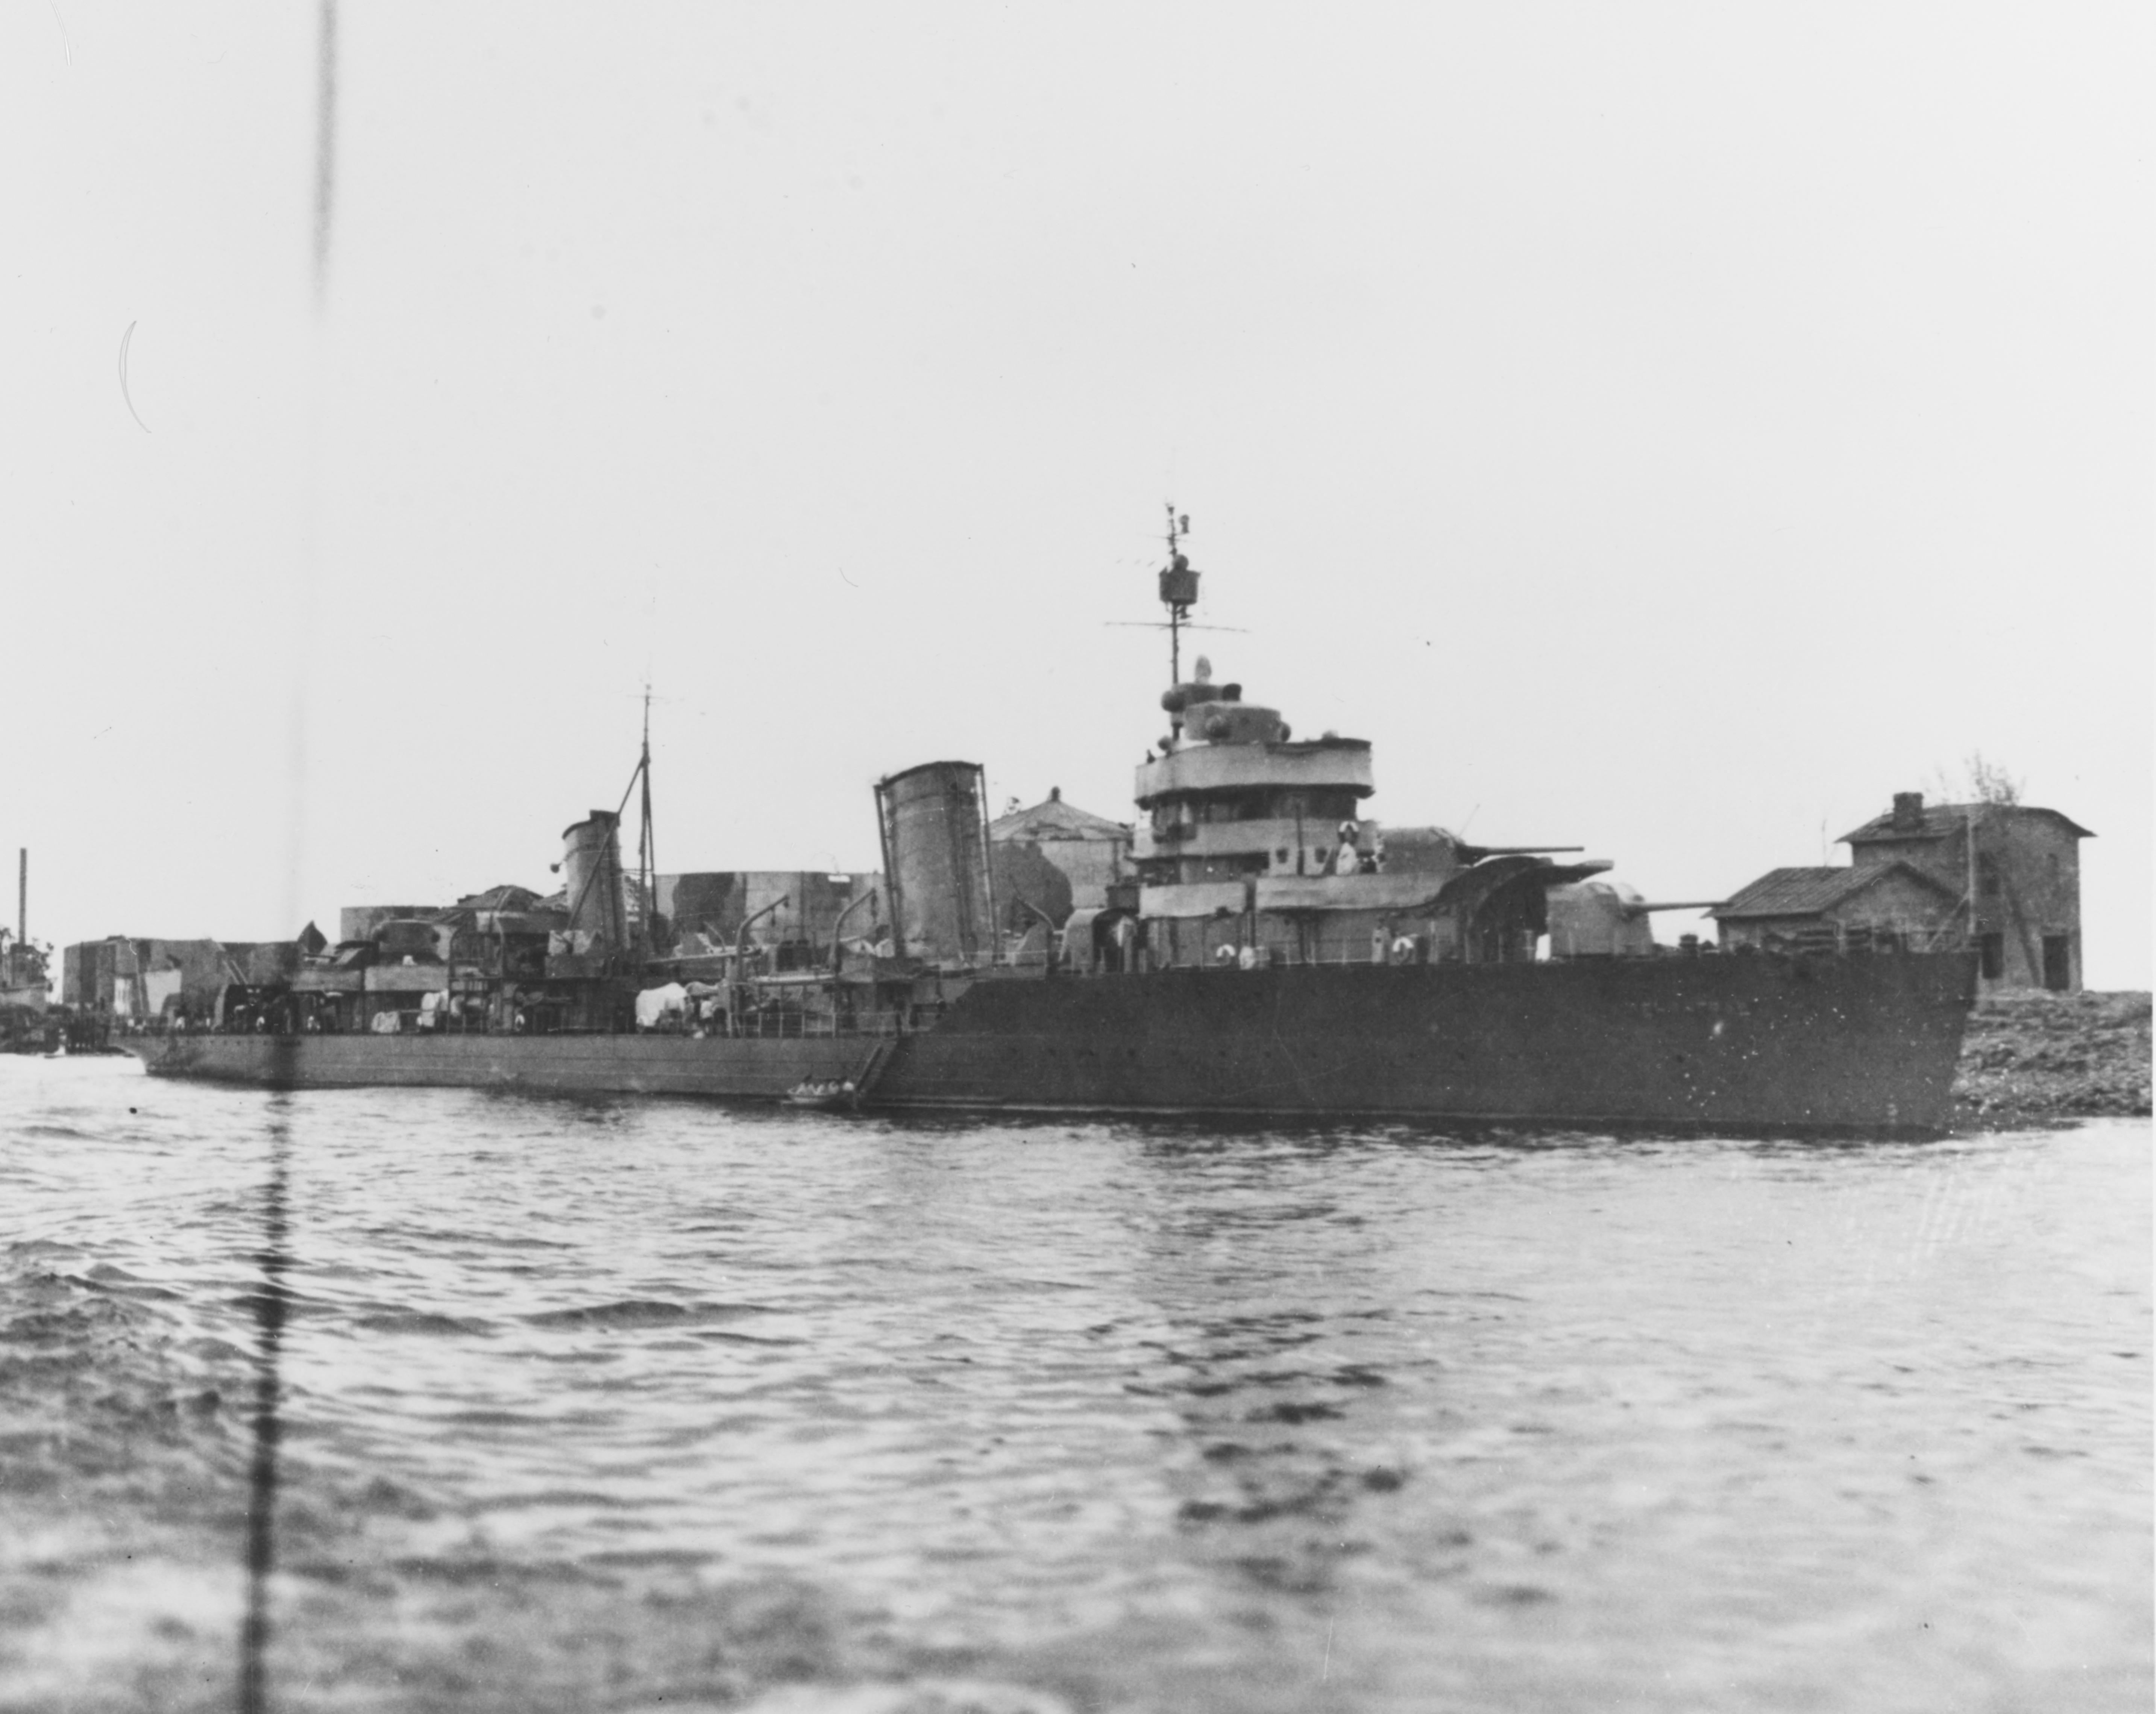 Leningrad-class destroyer - Wikipedia